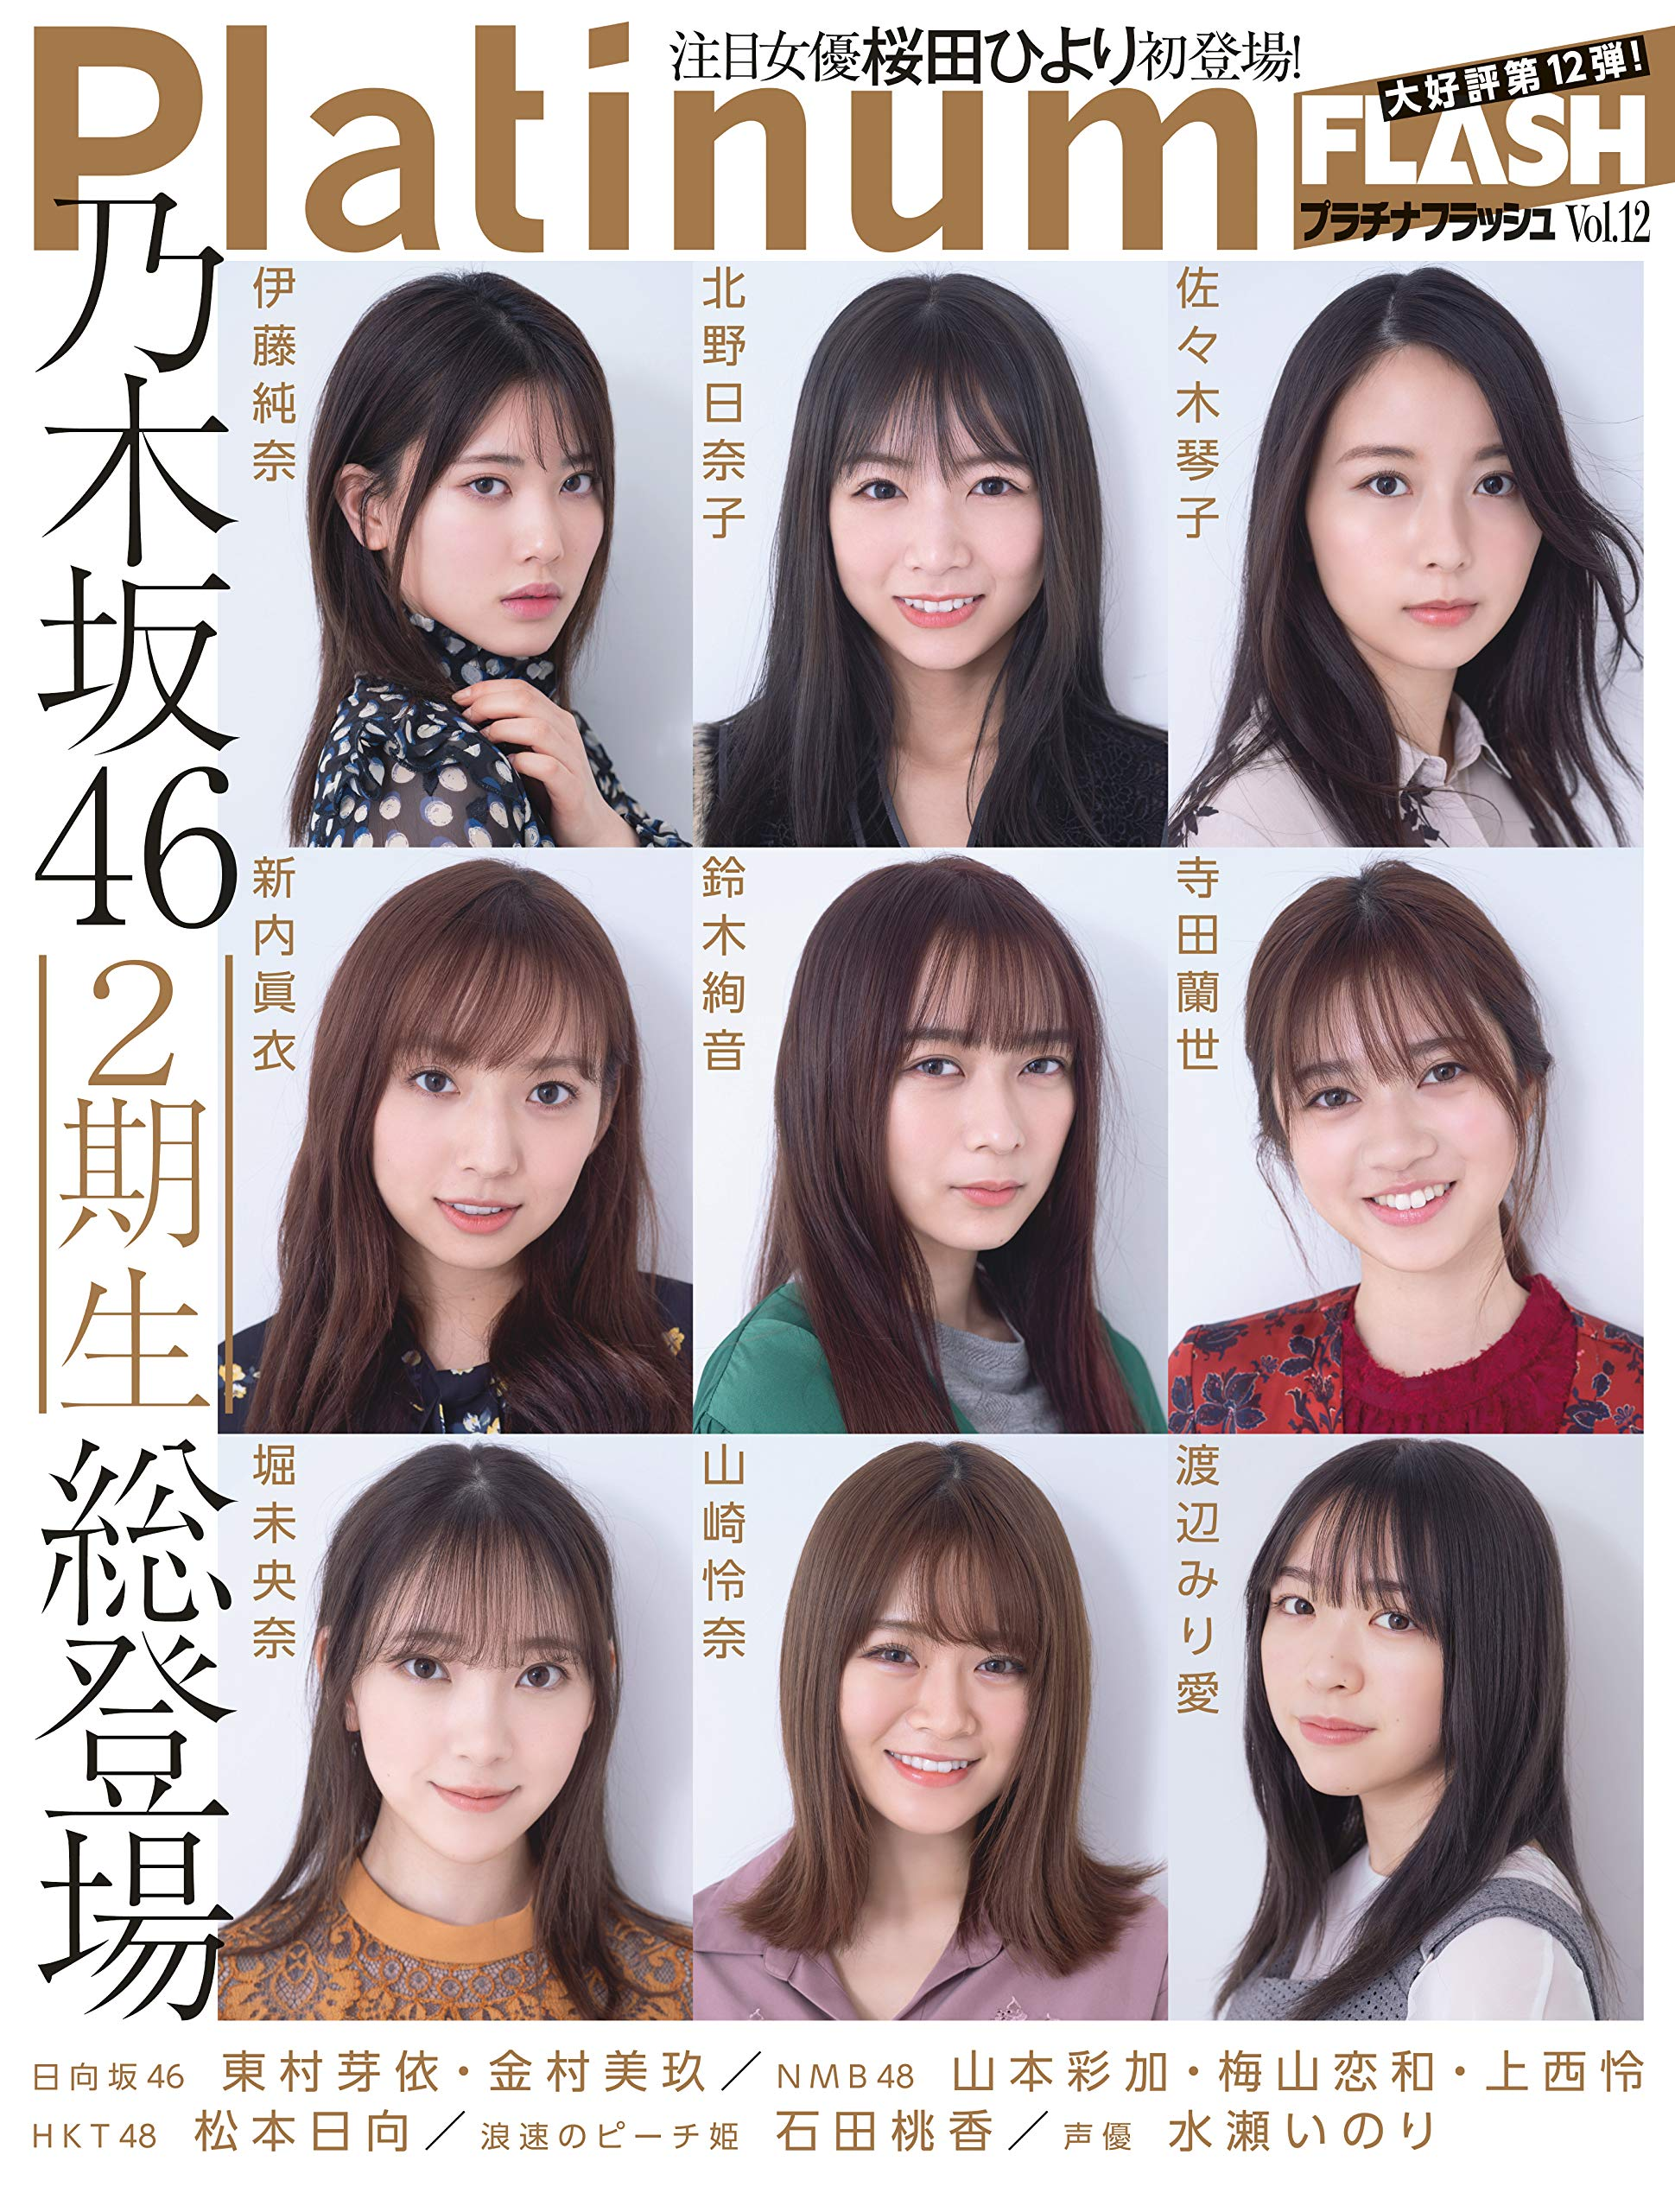 Platinum FLASH Vol.12 乃木坂46 2期生